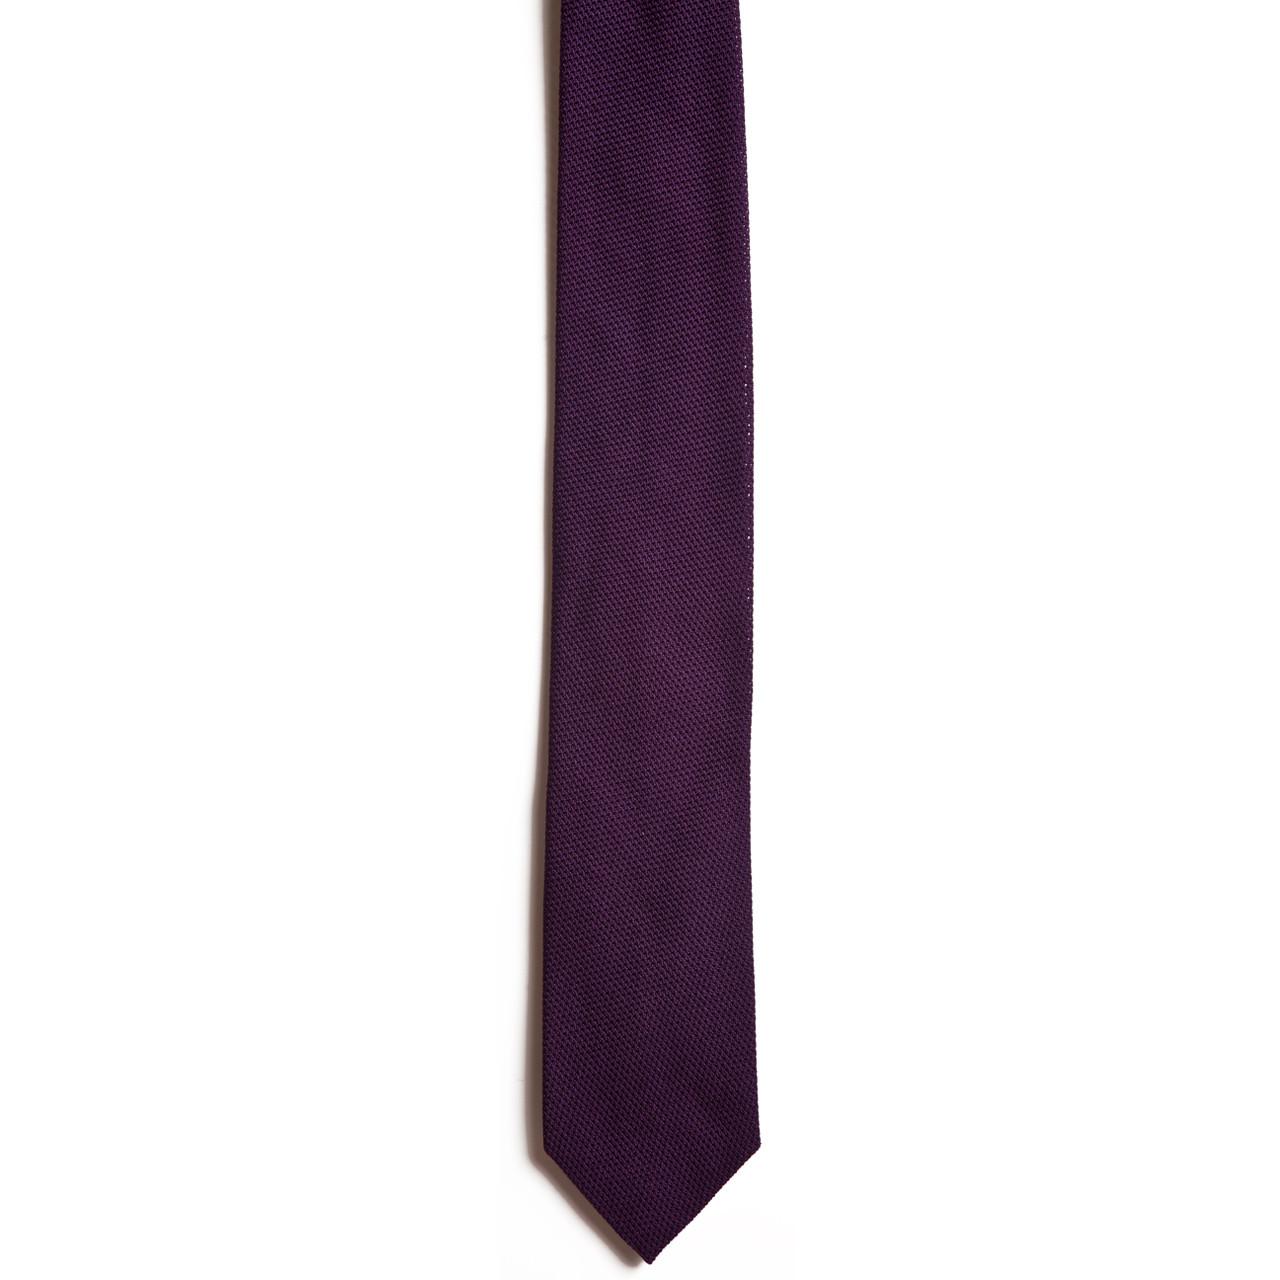 tie-grenadine-purple__11624.1380644902.1280.1280.jpg